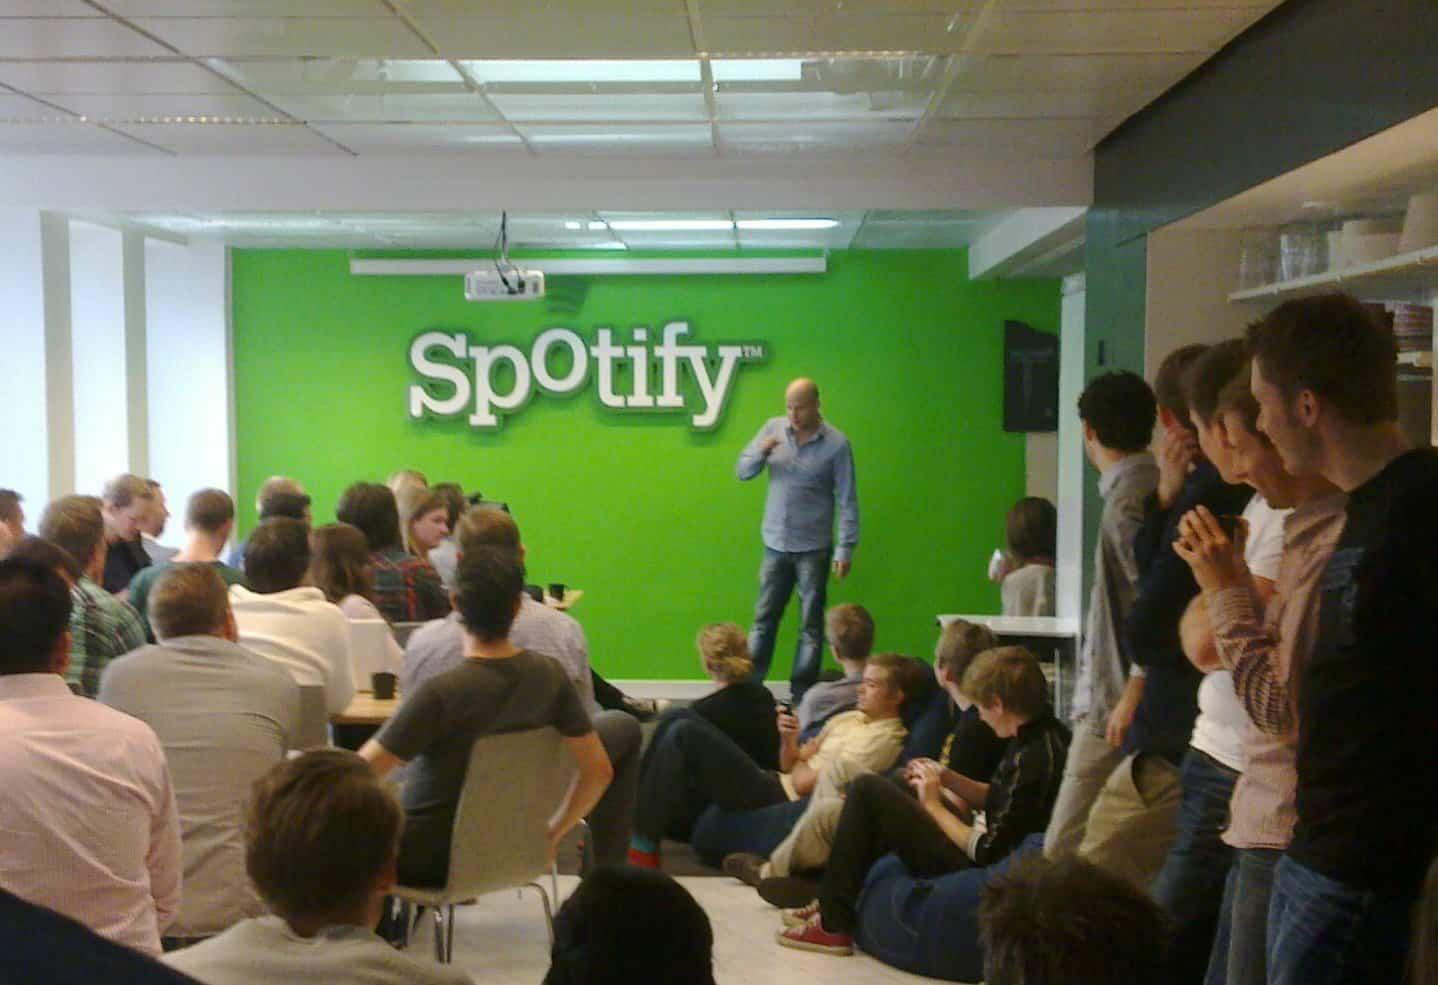 Spotify going public through a direct public offering https://commons.wikimedia.org/wiki/File:Daniel_Ek_addressing_Spotify_staff.jpg